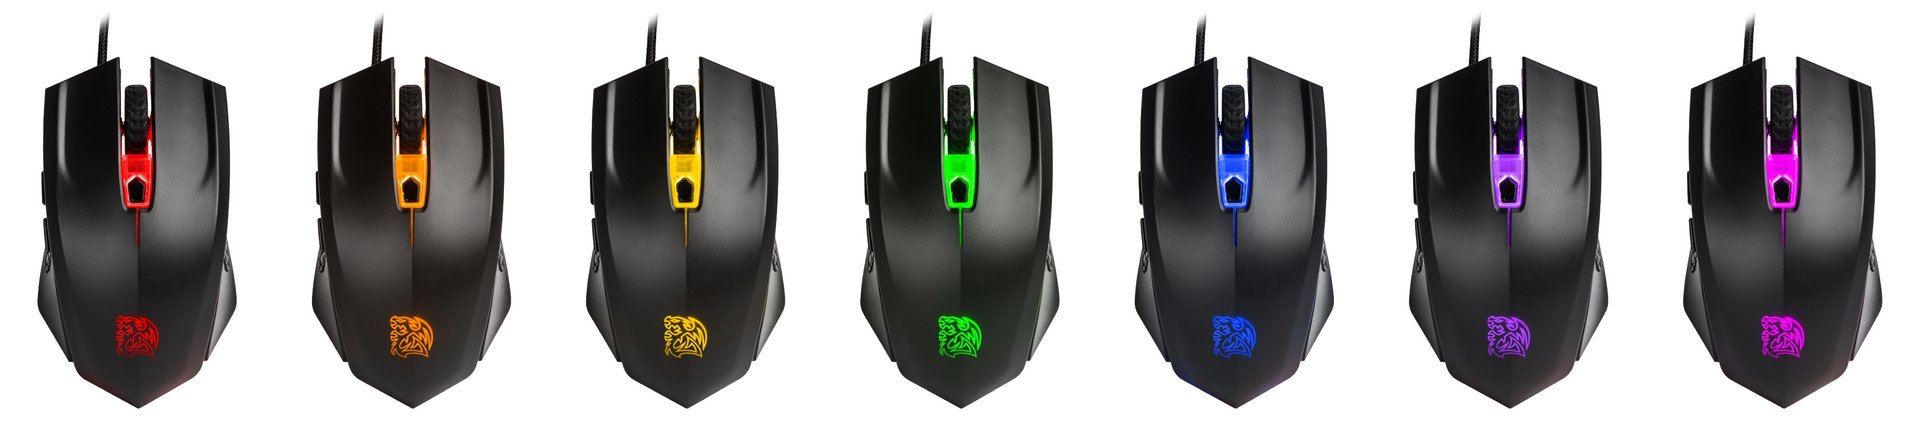 Tt eSports Challenger Primer RGB